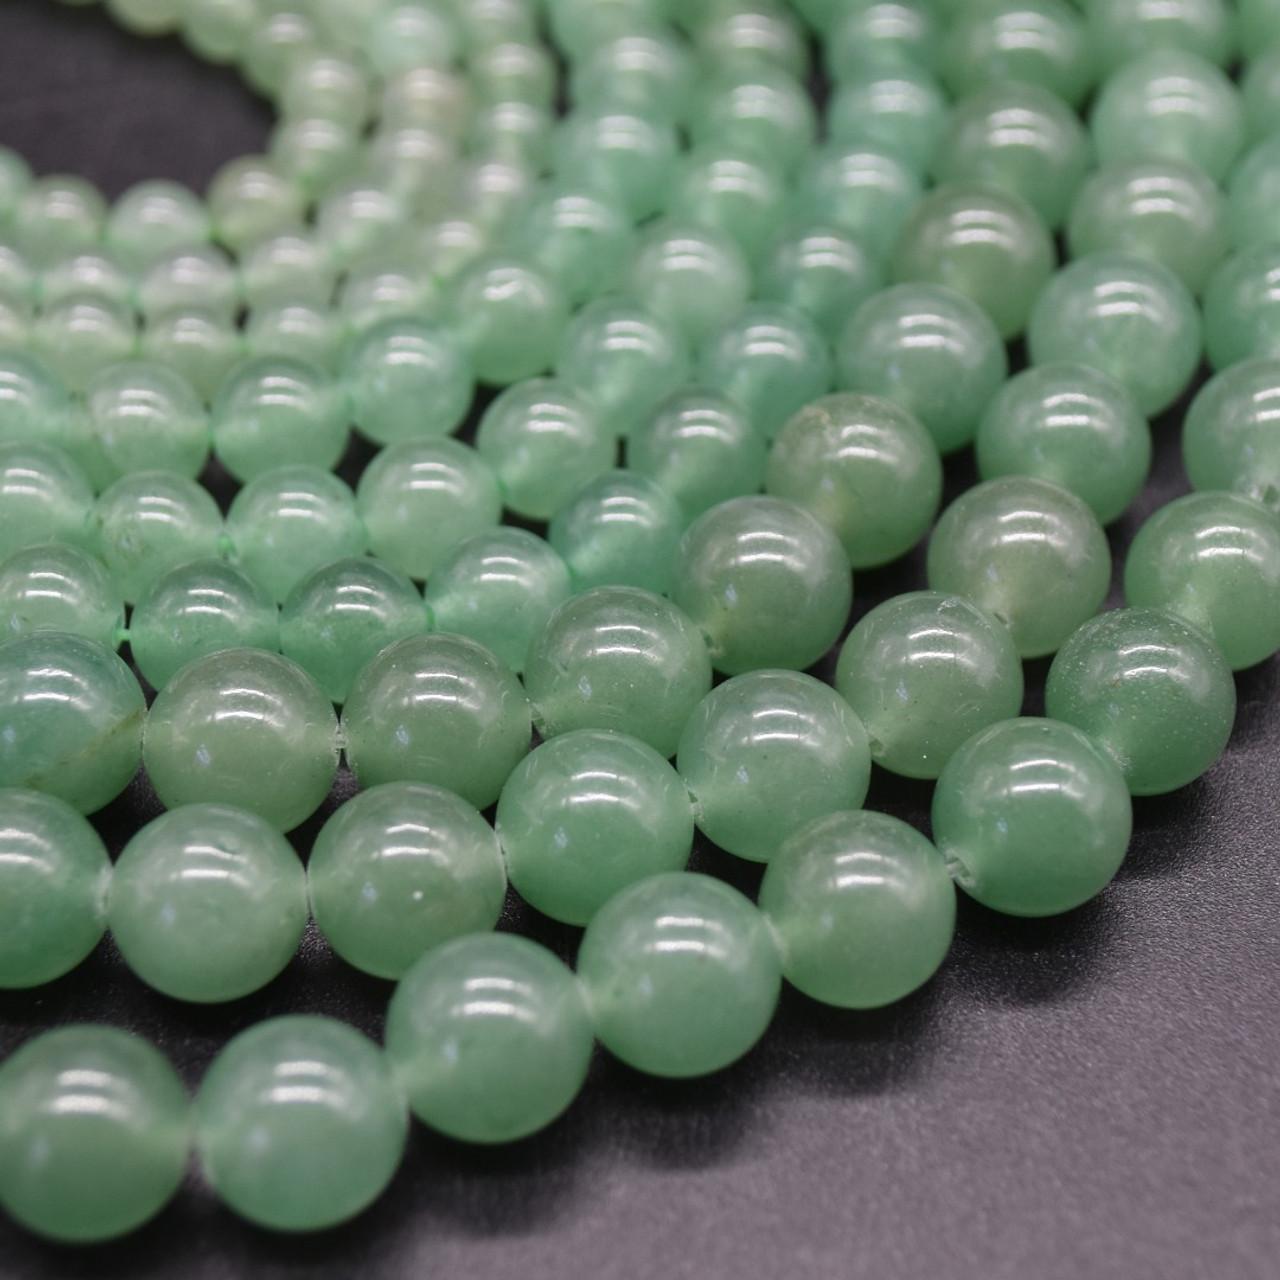 8mm Natural Green Aventurine 46 Round Beads 1mm Hole